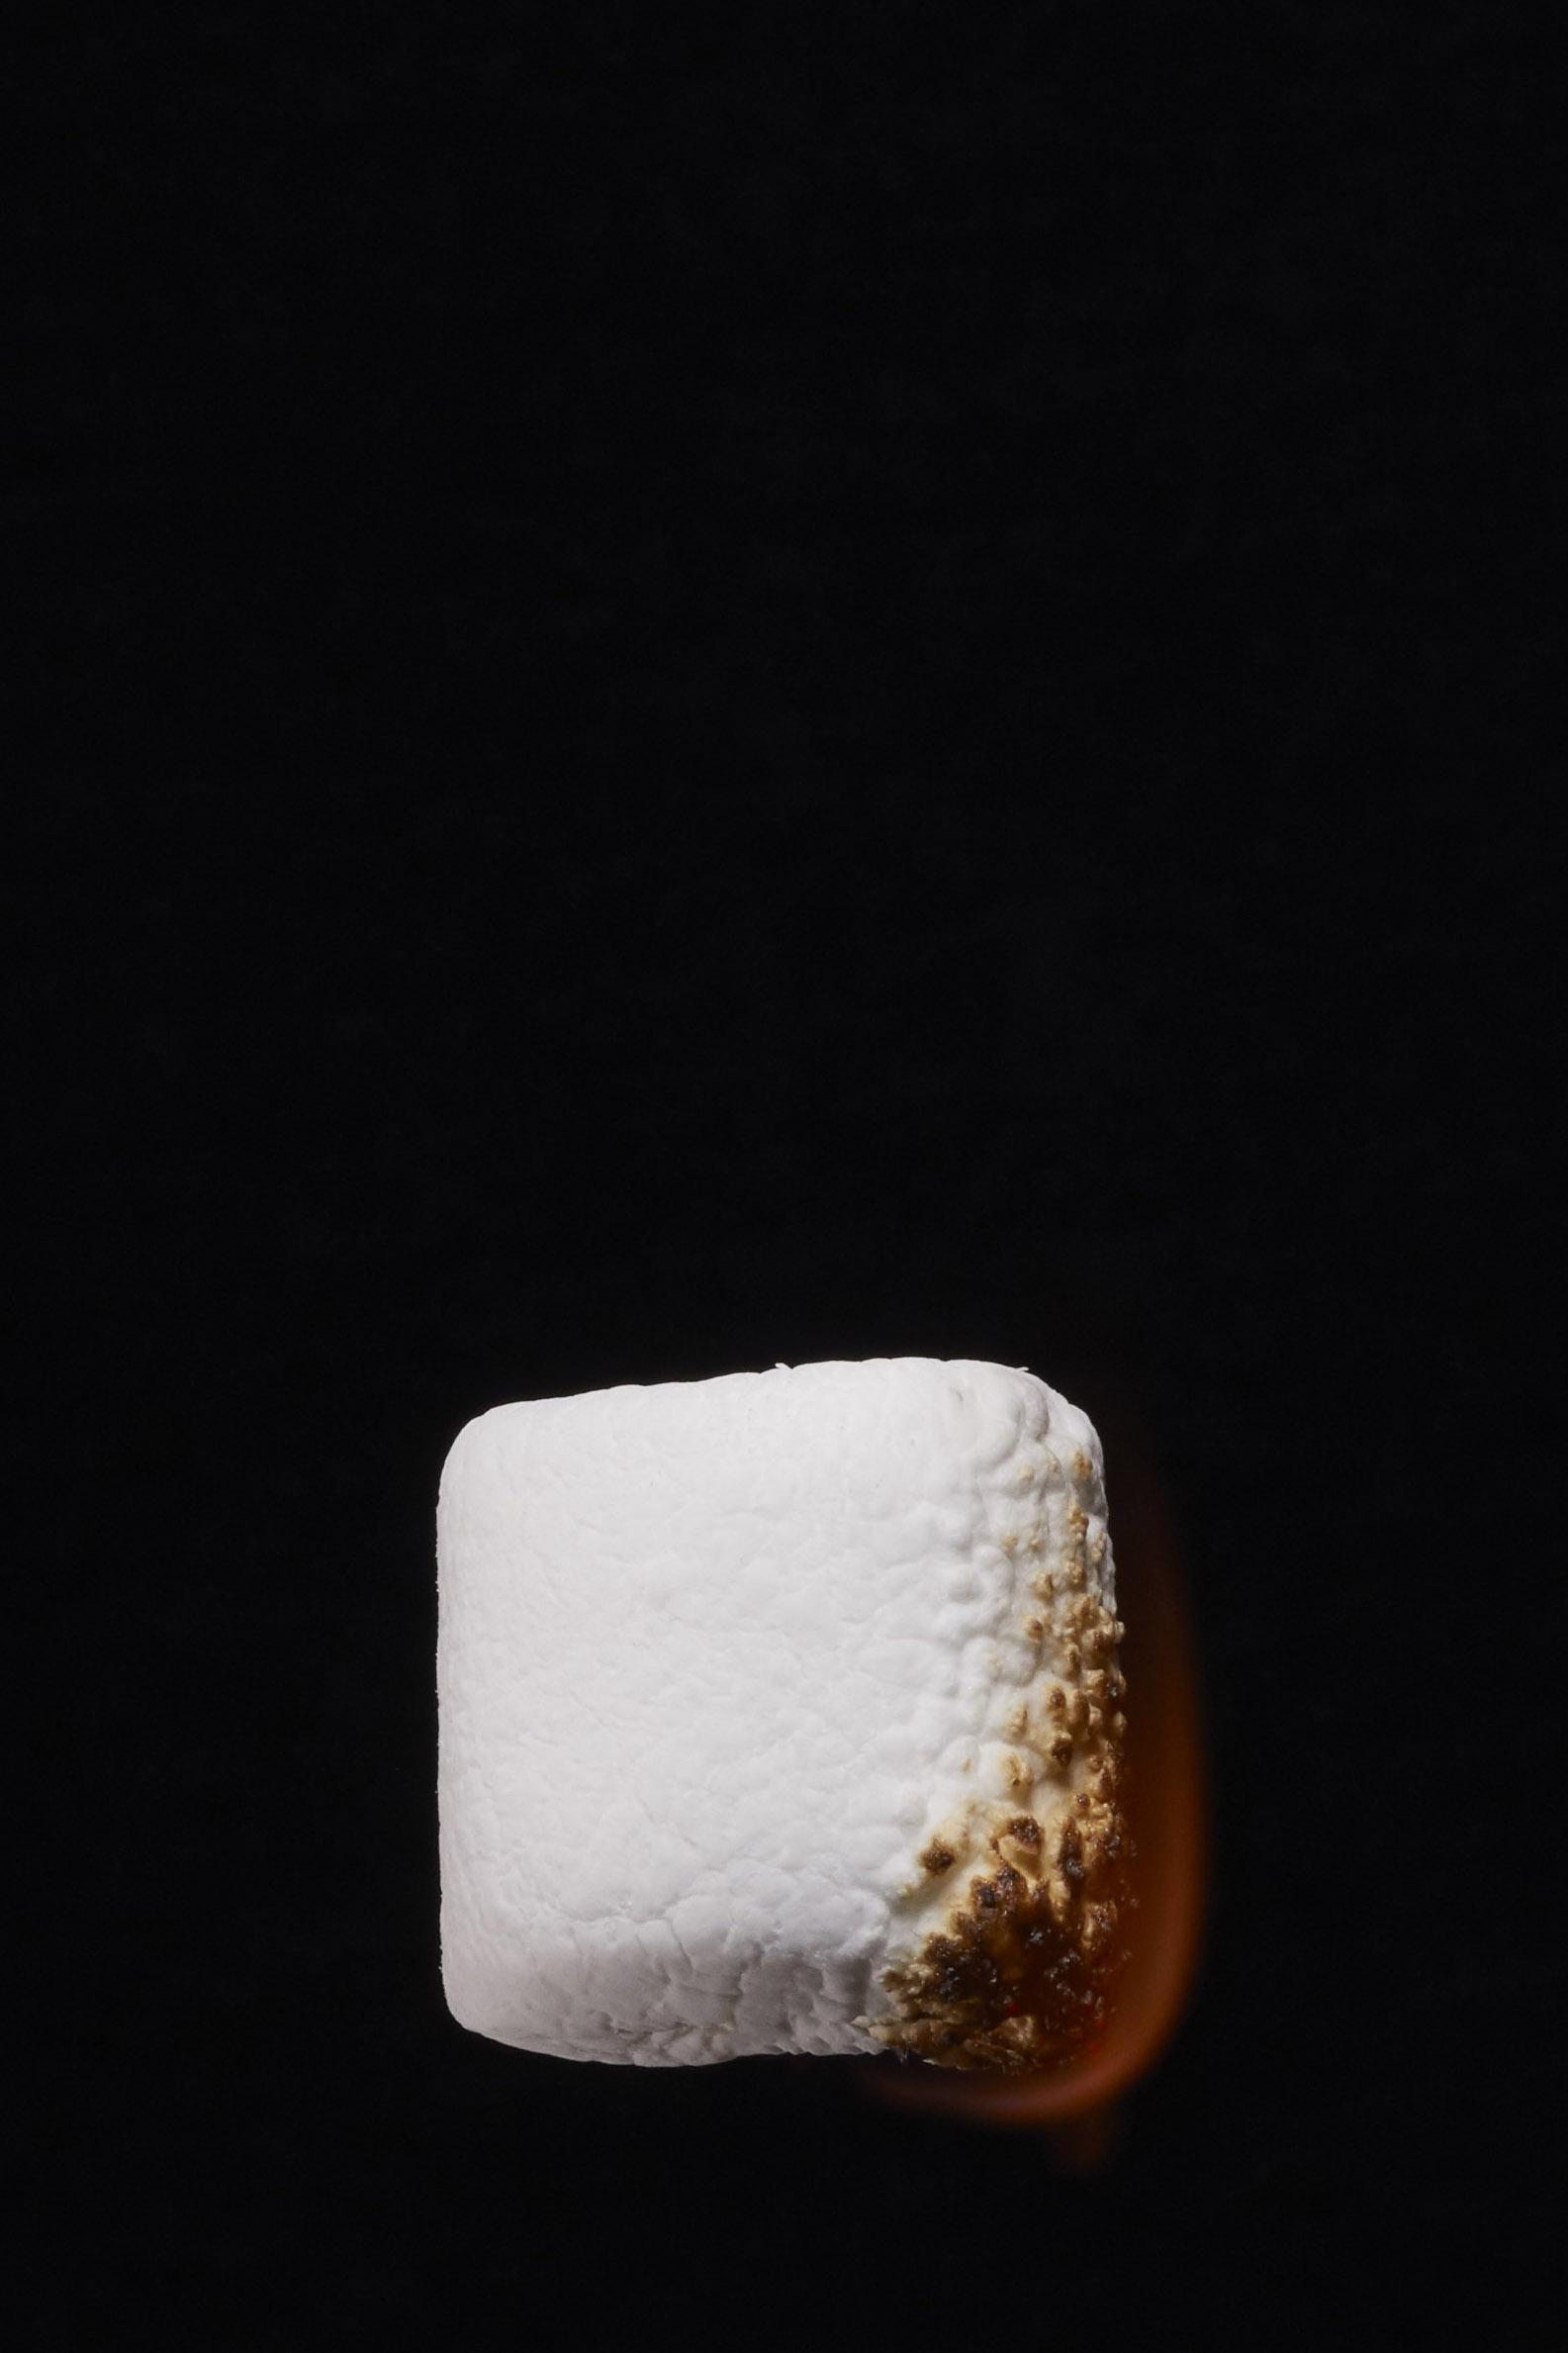 Marshmellow1337 begin